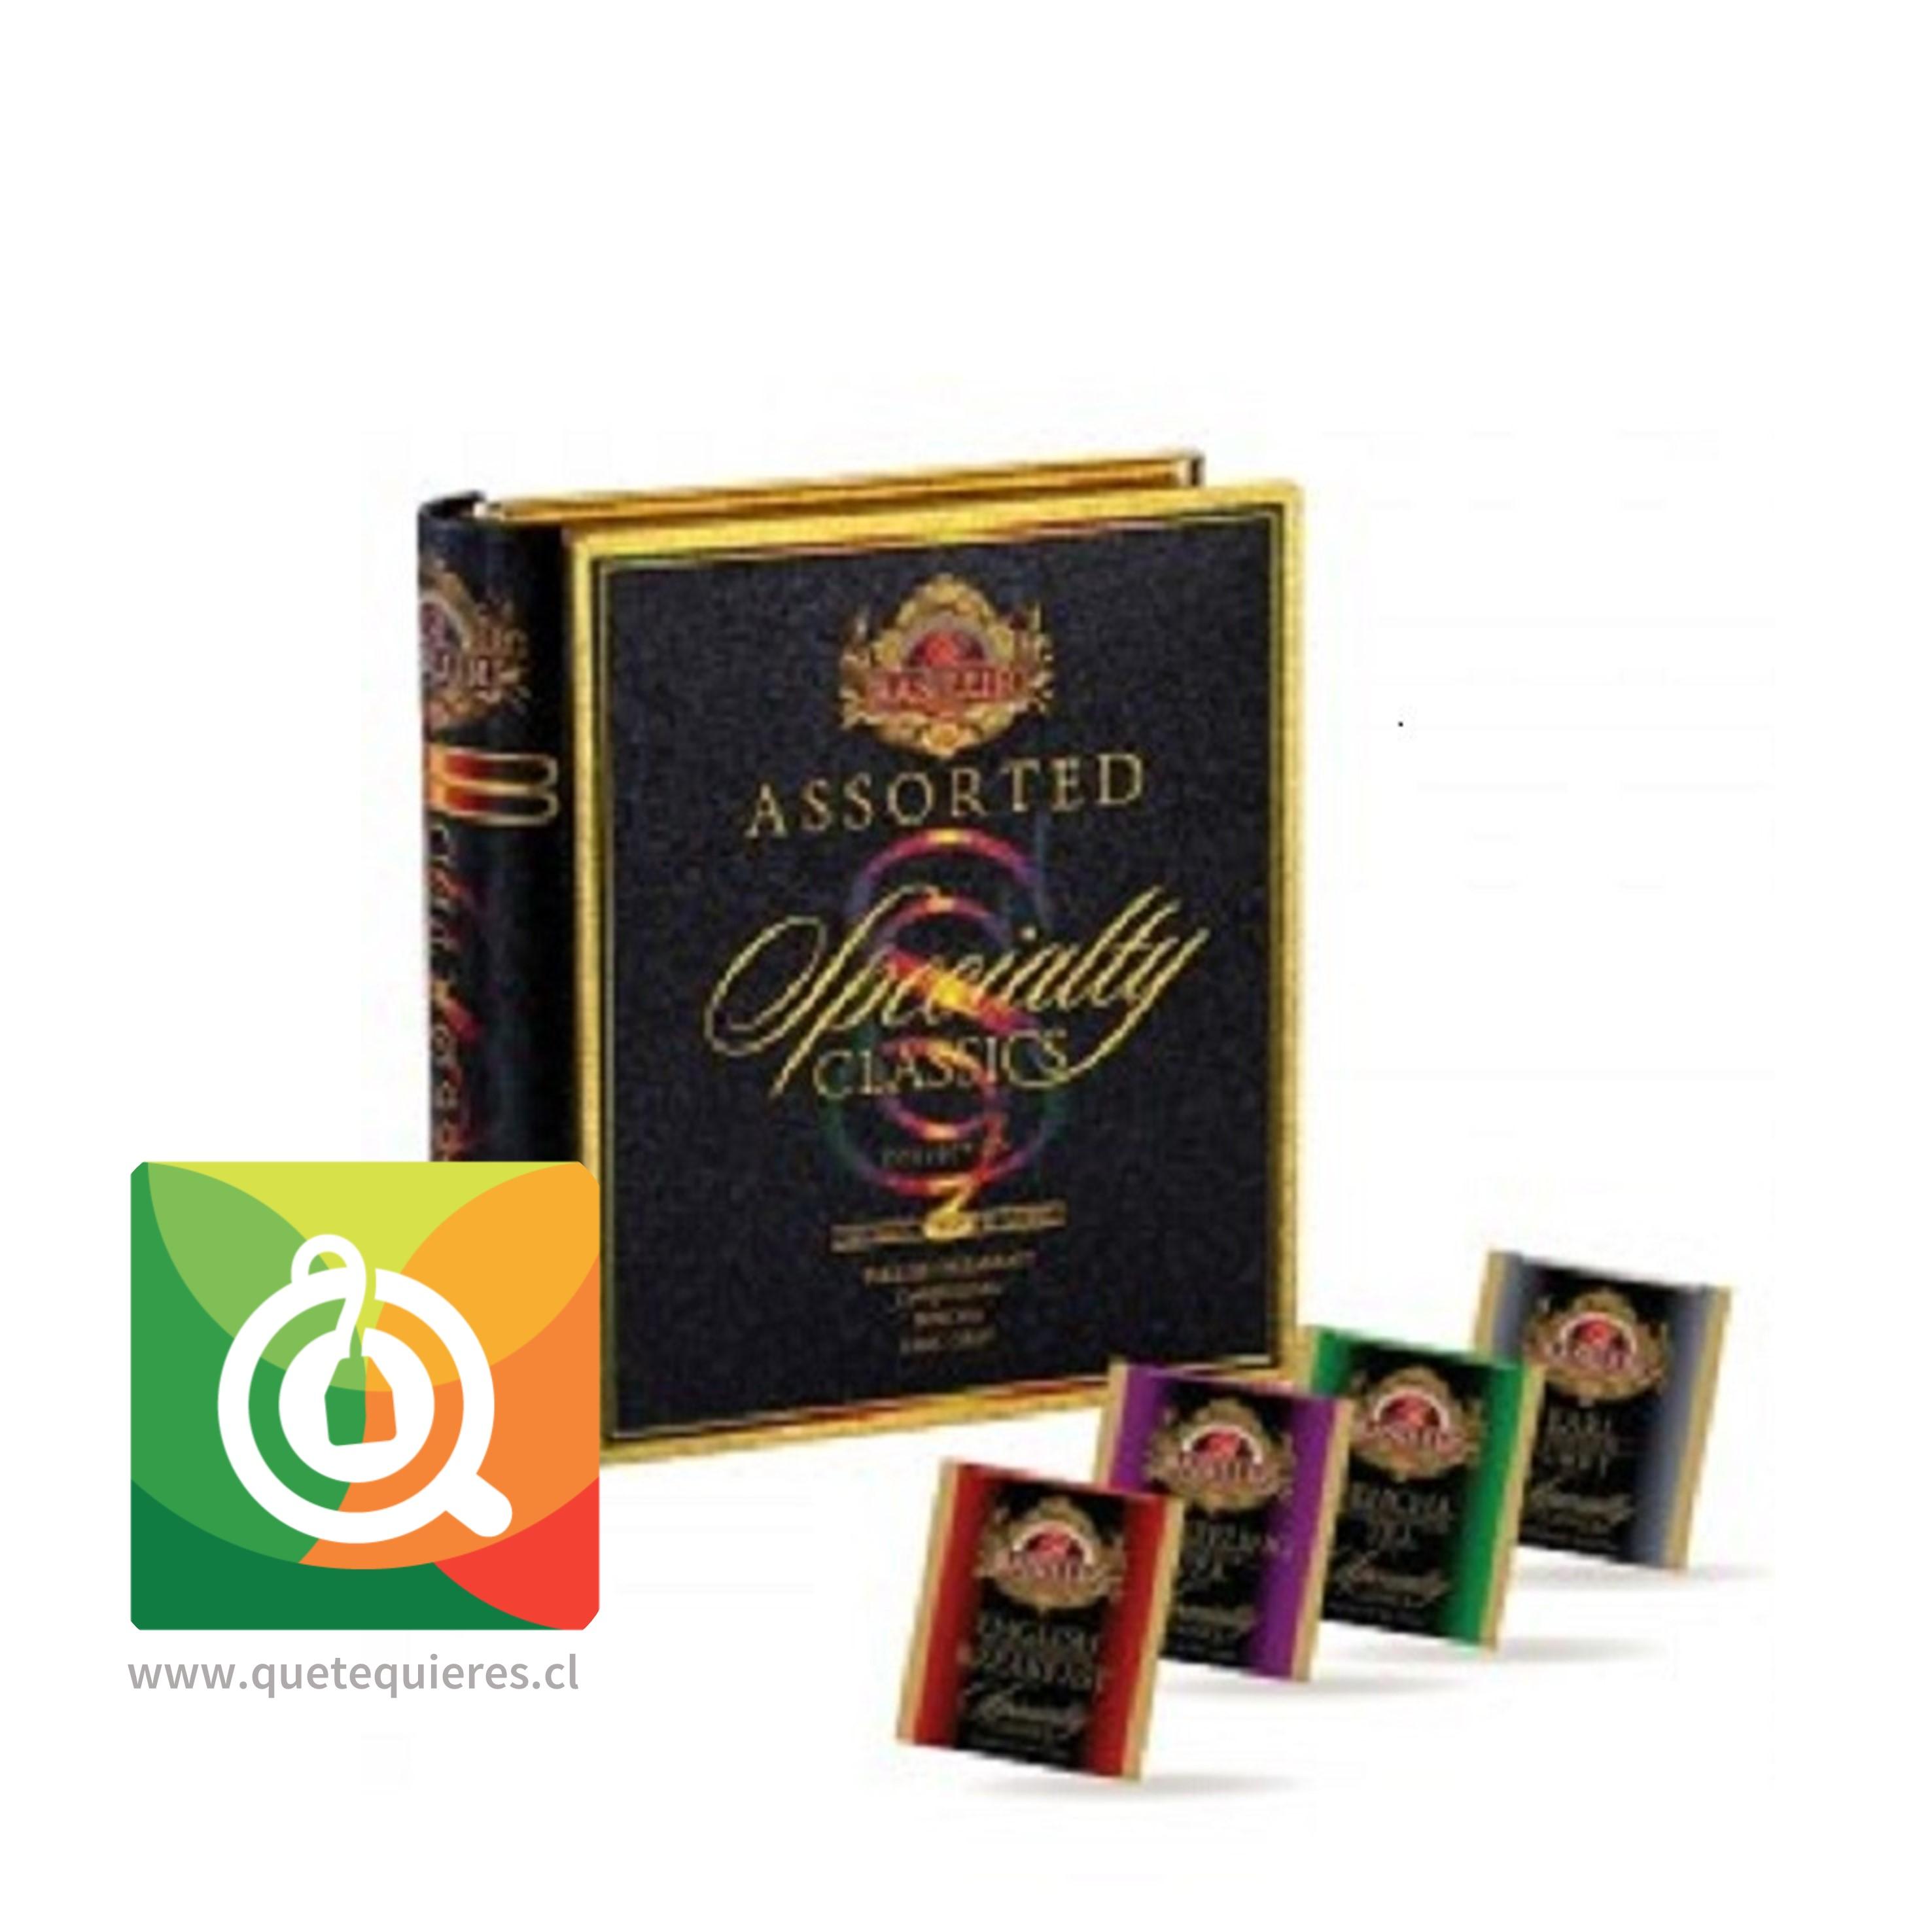 Basilur Libro Té Surtido Té Negro Clasico - Specialty Classics Tea Book Assorted- Image 2